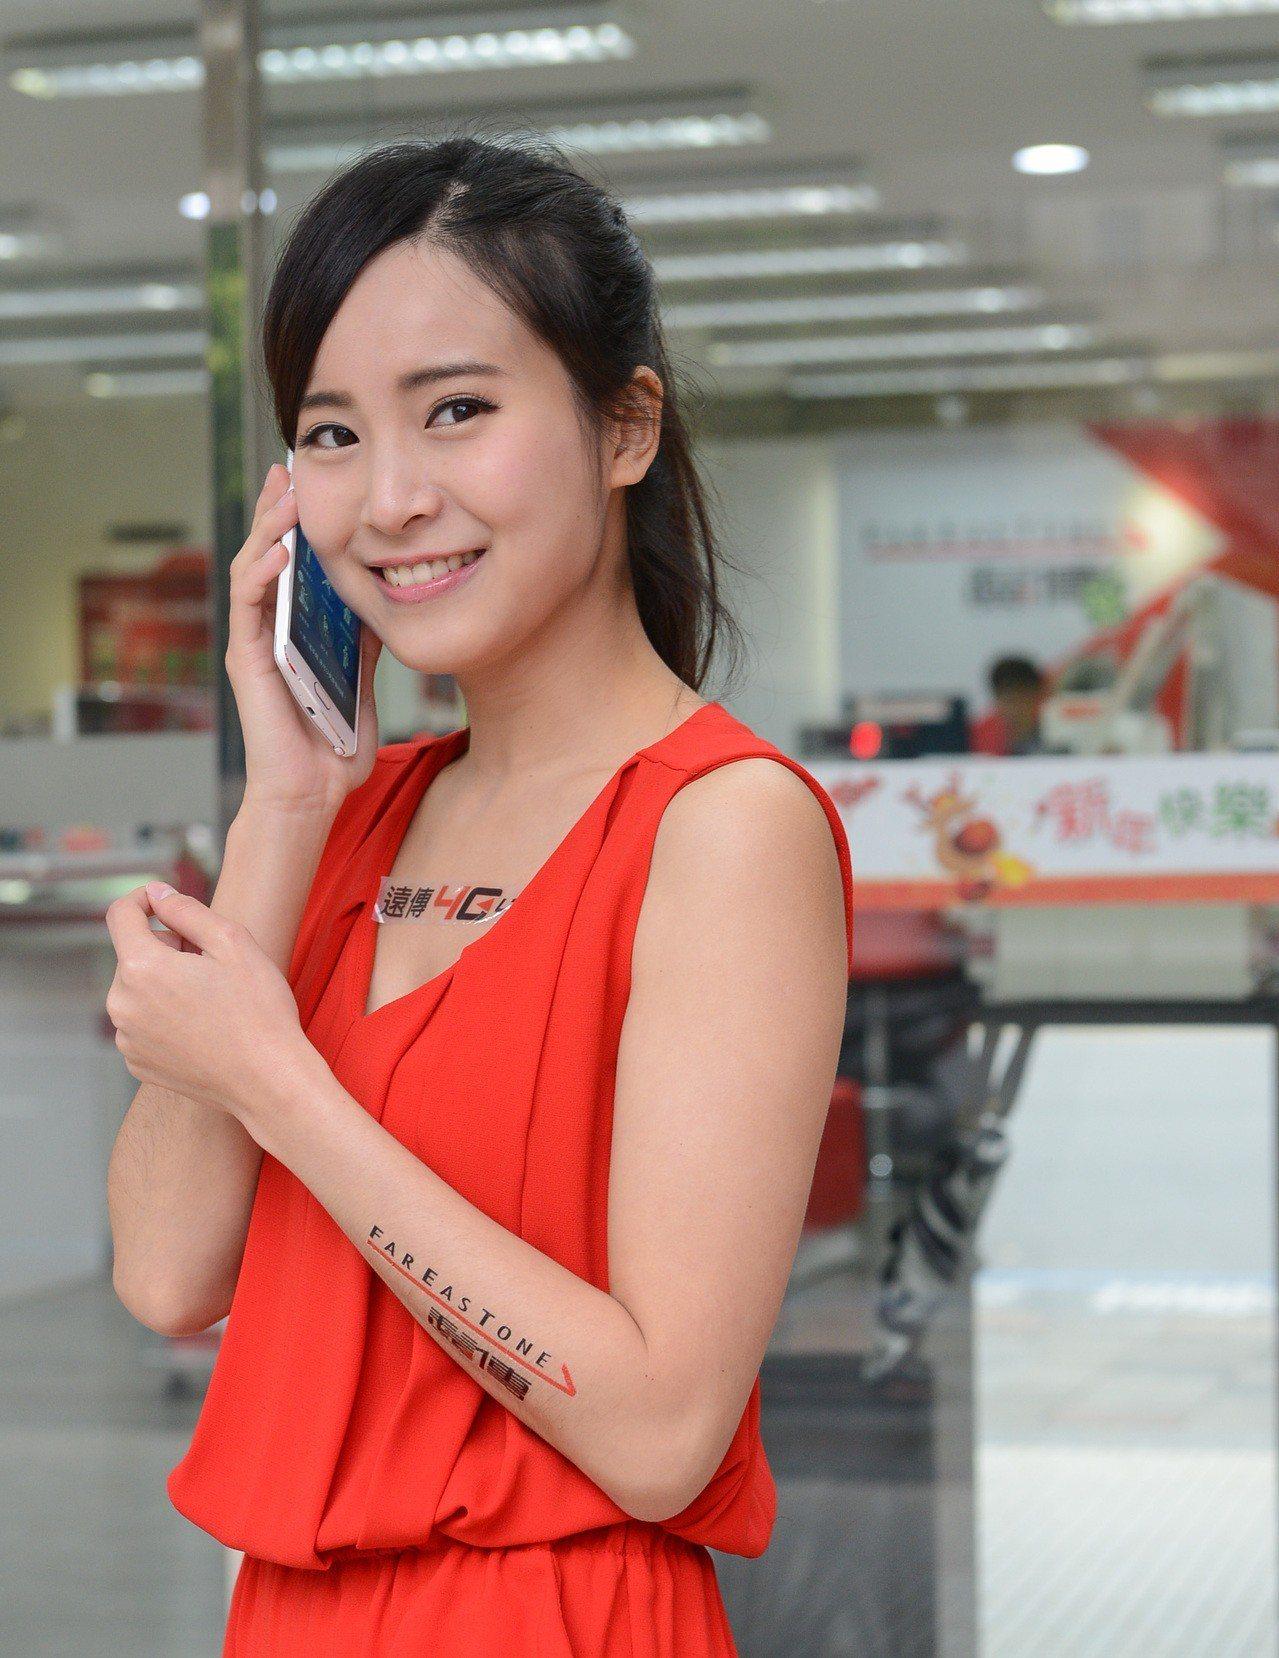 3G行動通話業務將於12月31日正式走入歷史,遠傳電信呼籲用戶盡快完成升頻作業。...